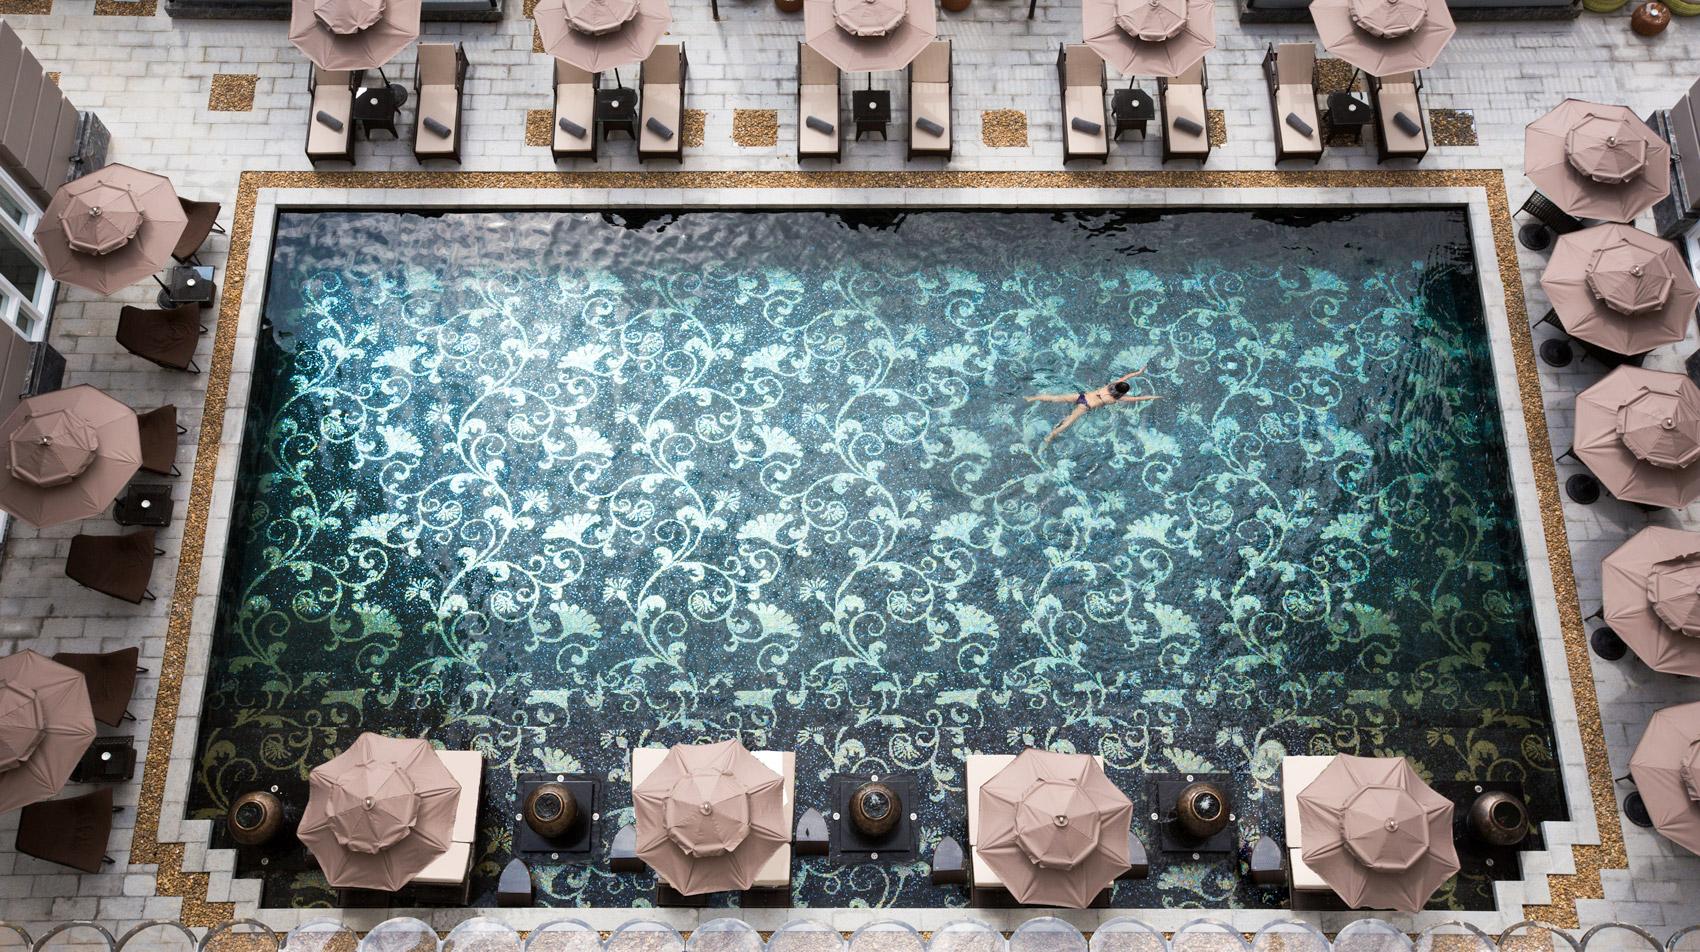 Riverside Luxury At Hotel Royal Hoi An, Vietnam 5